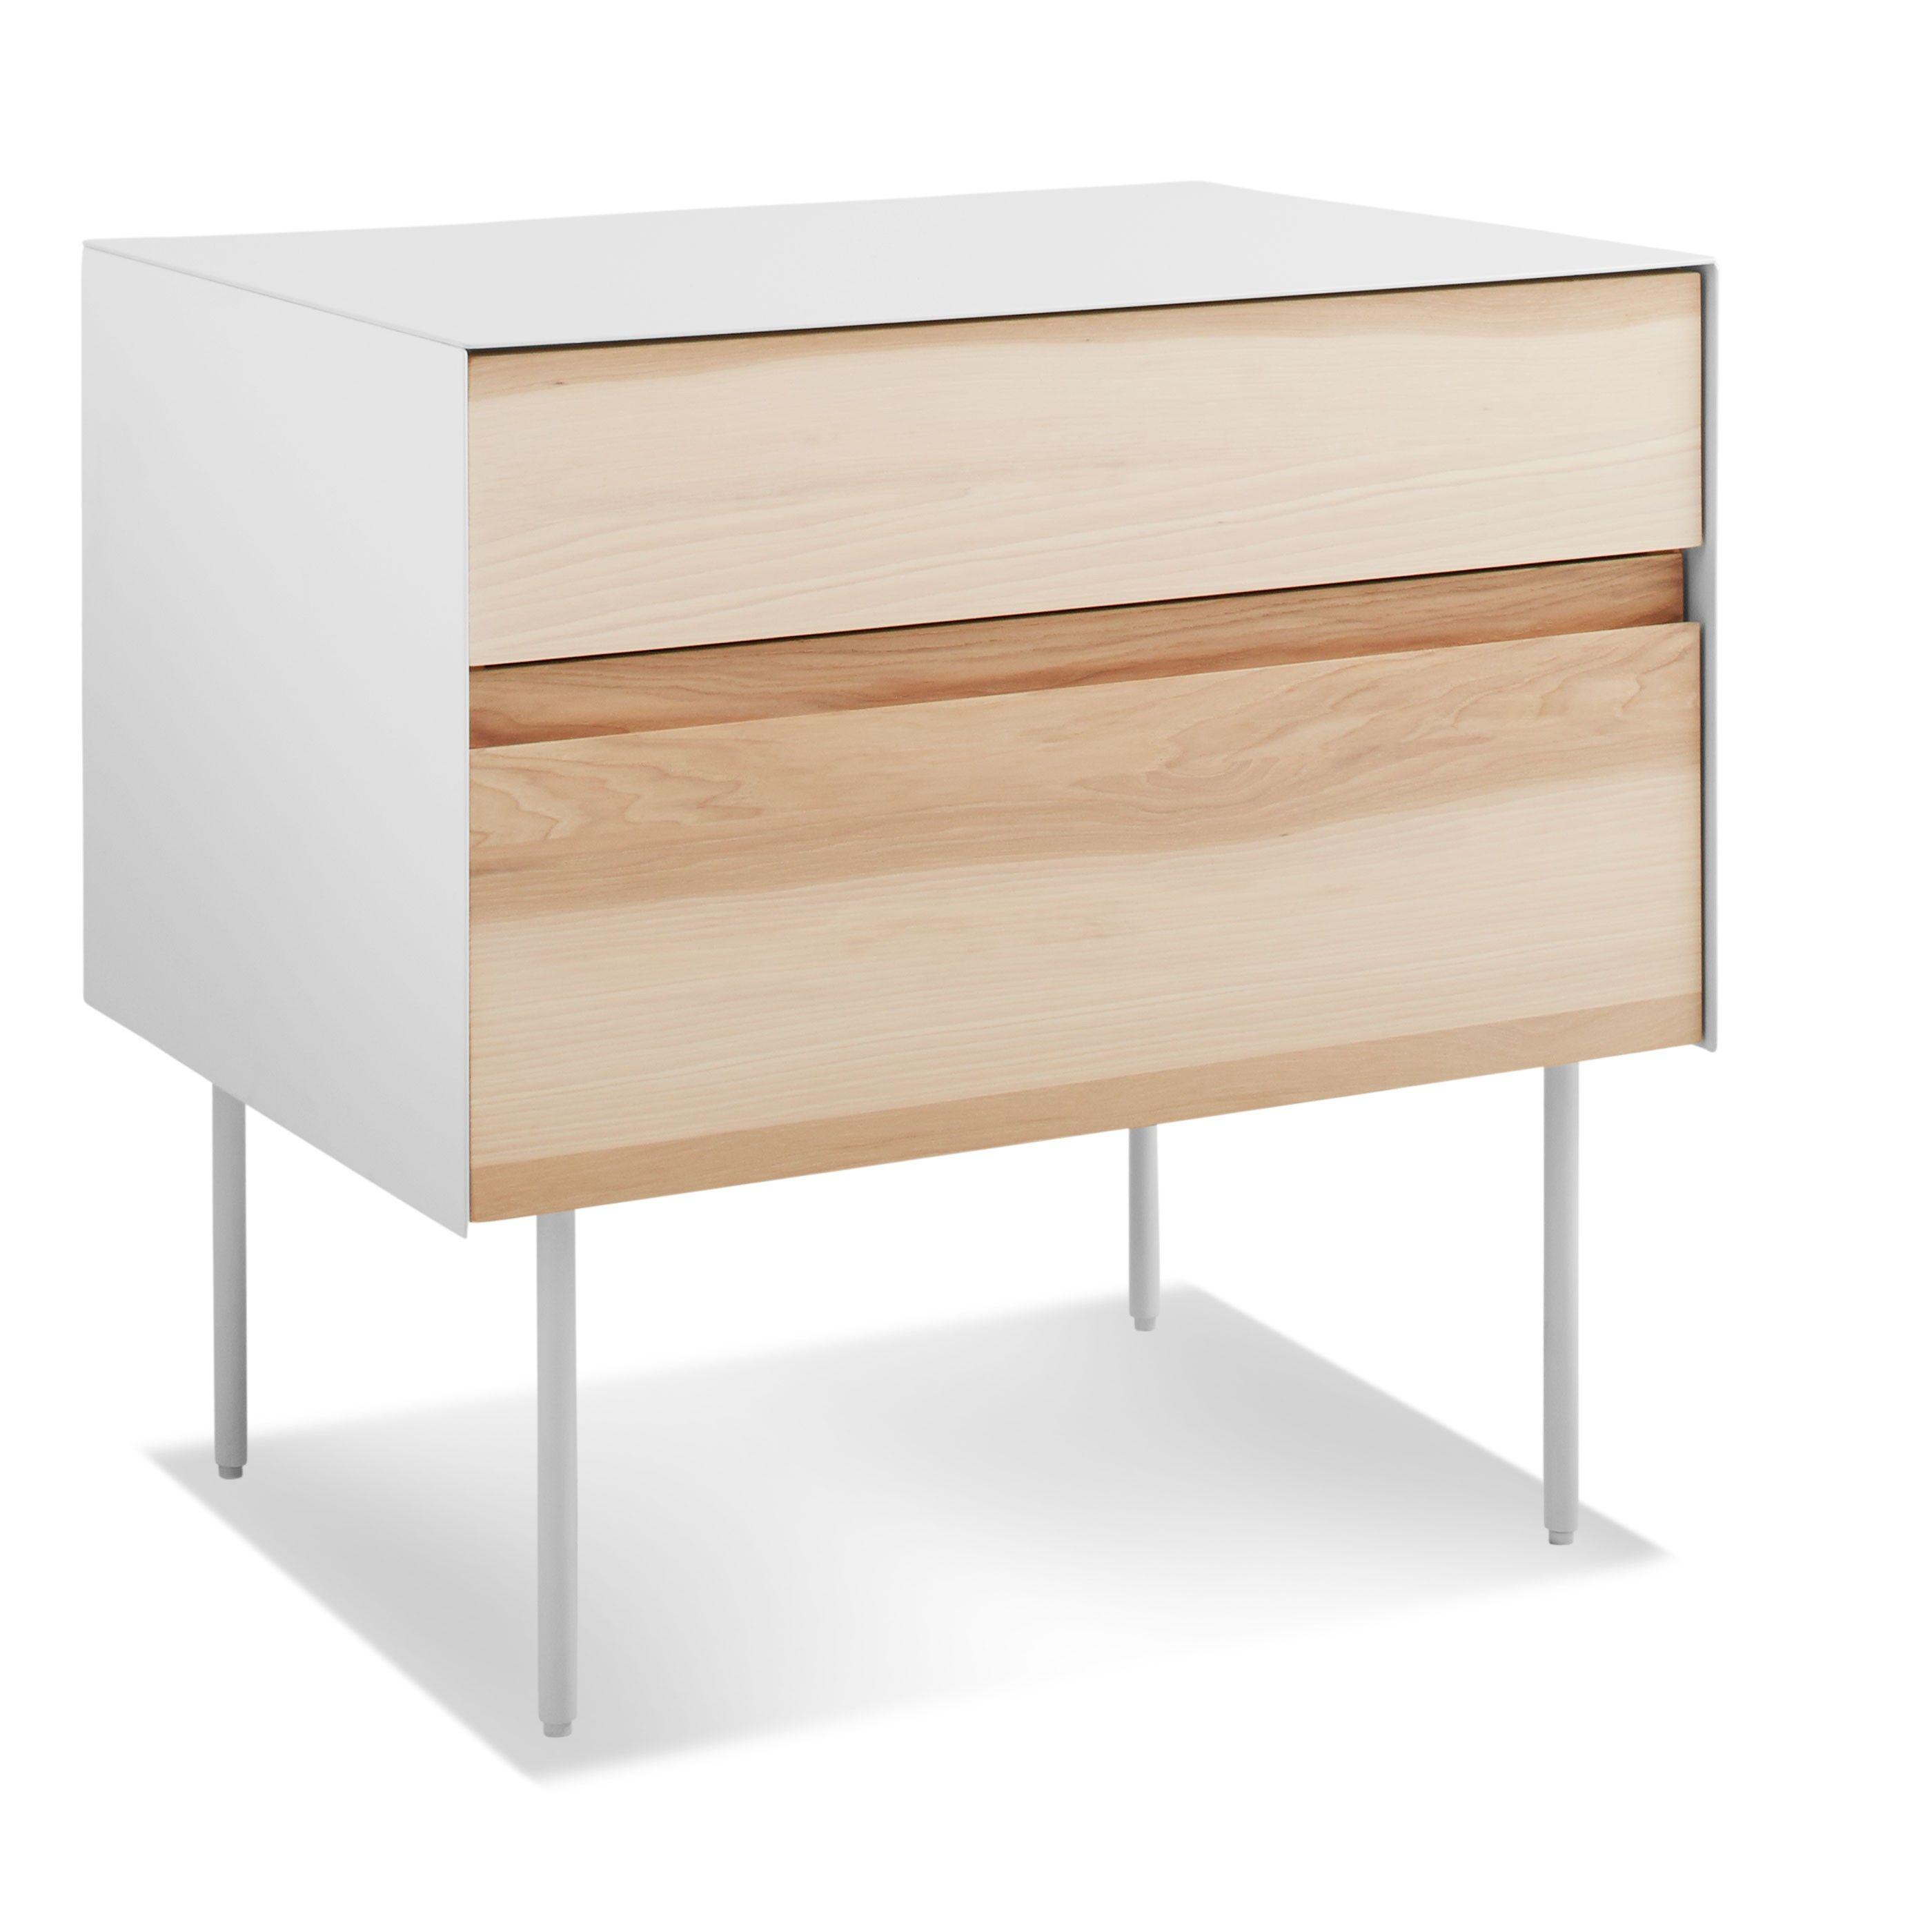 Clad Nightstand Nightstand, Modern bedside table